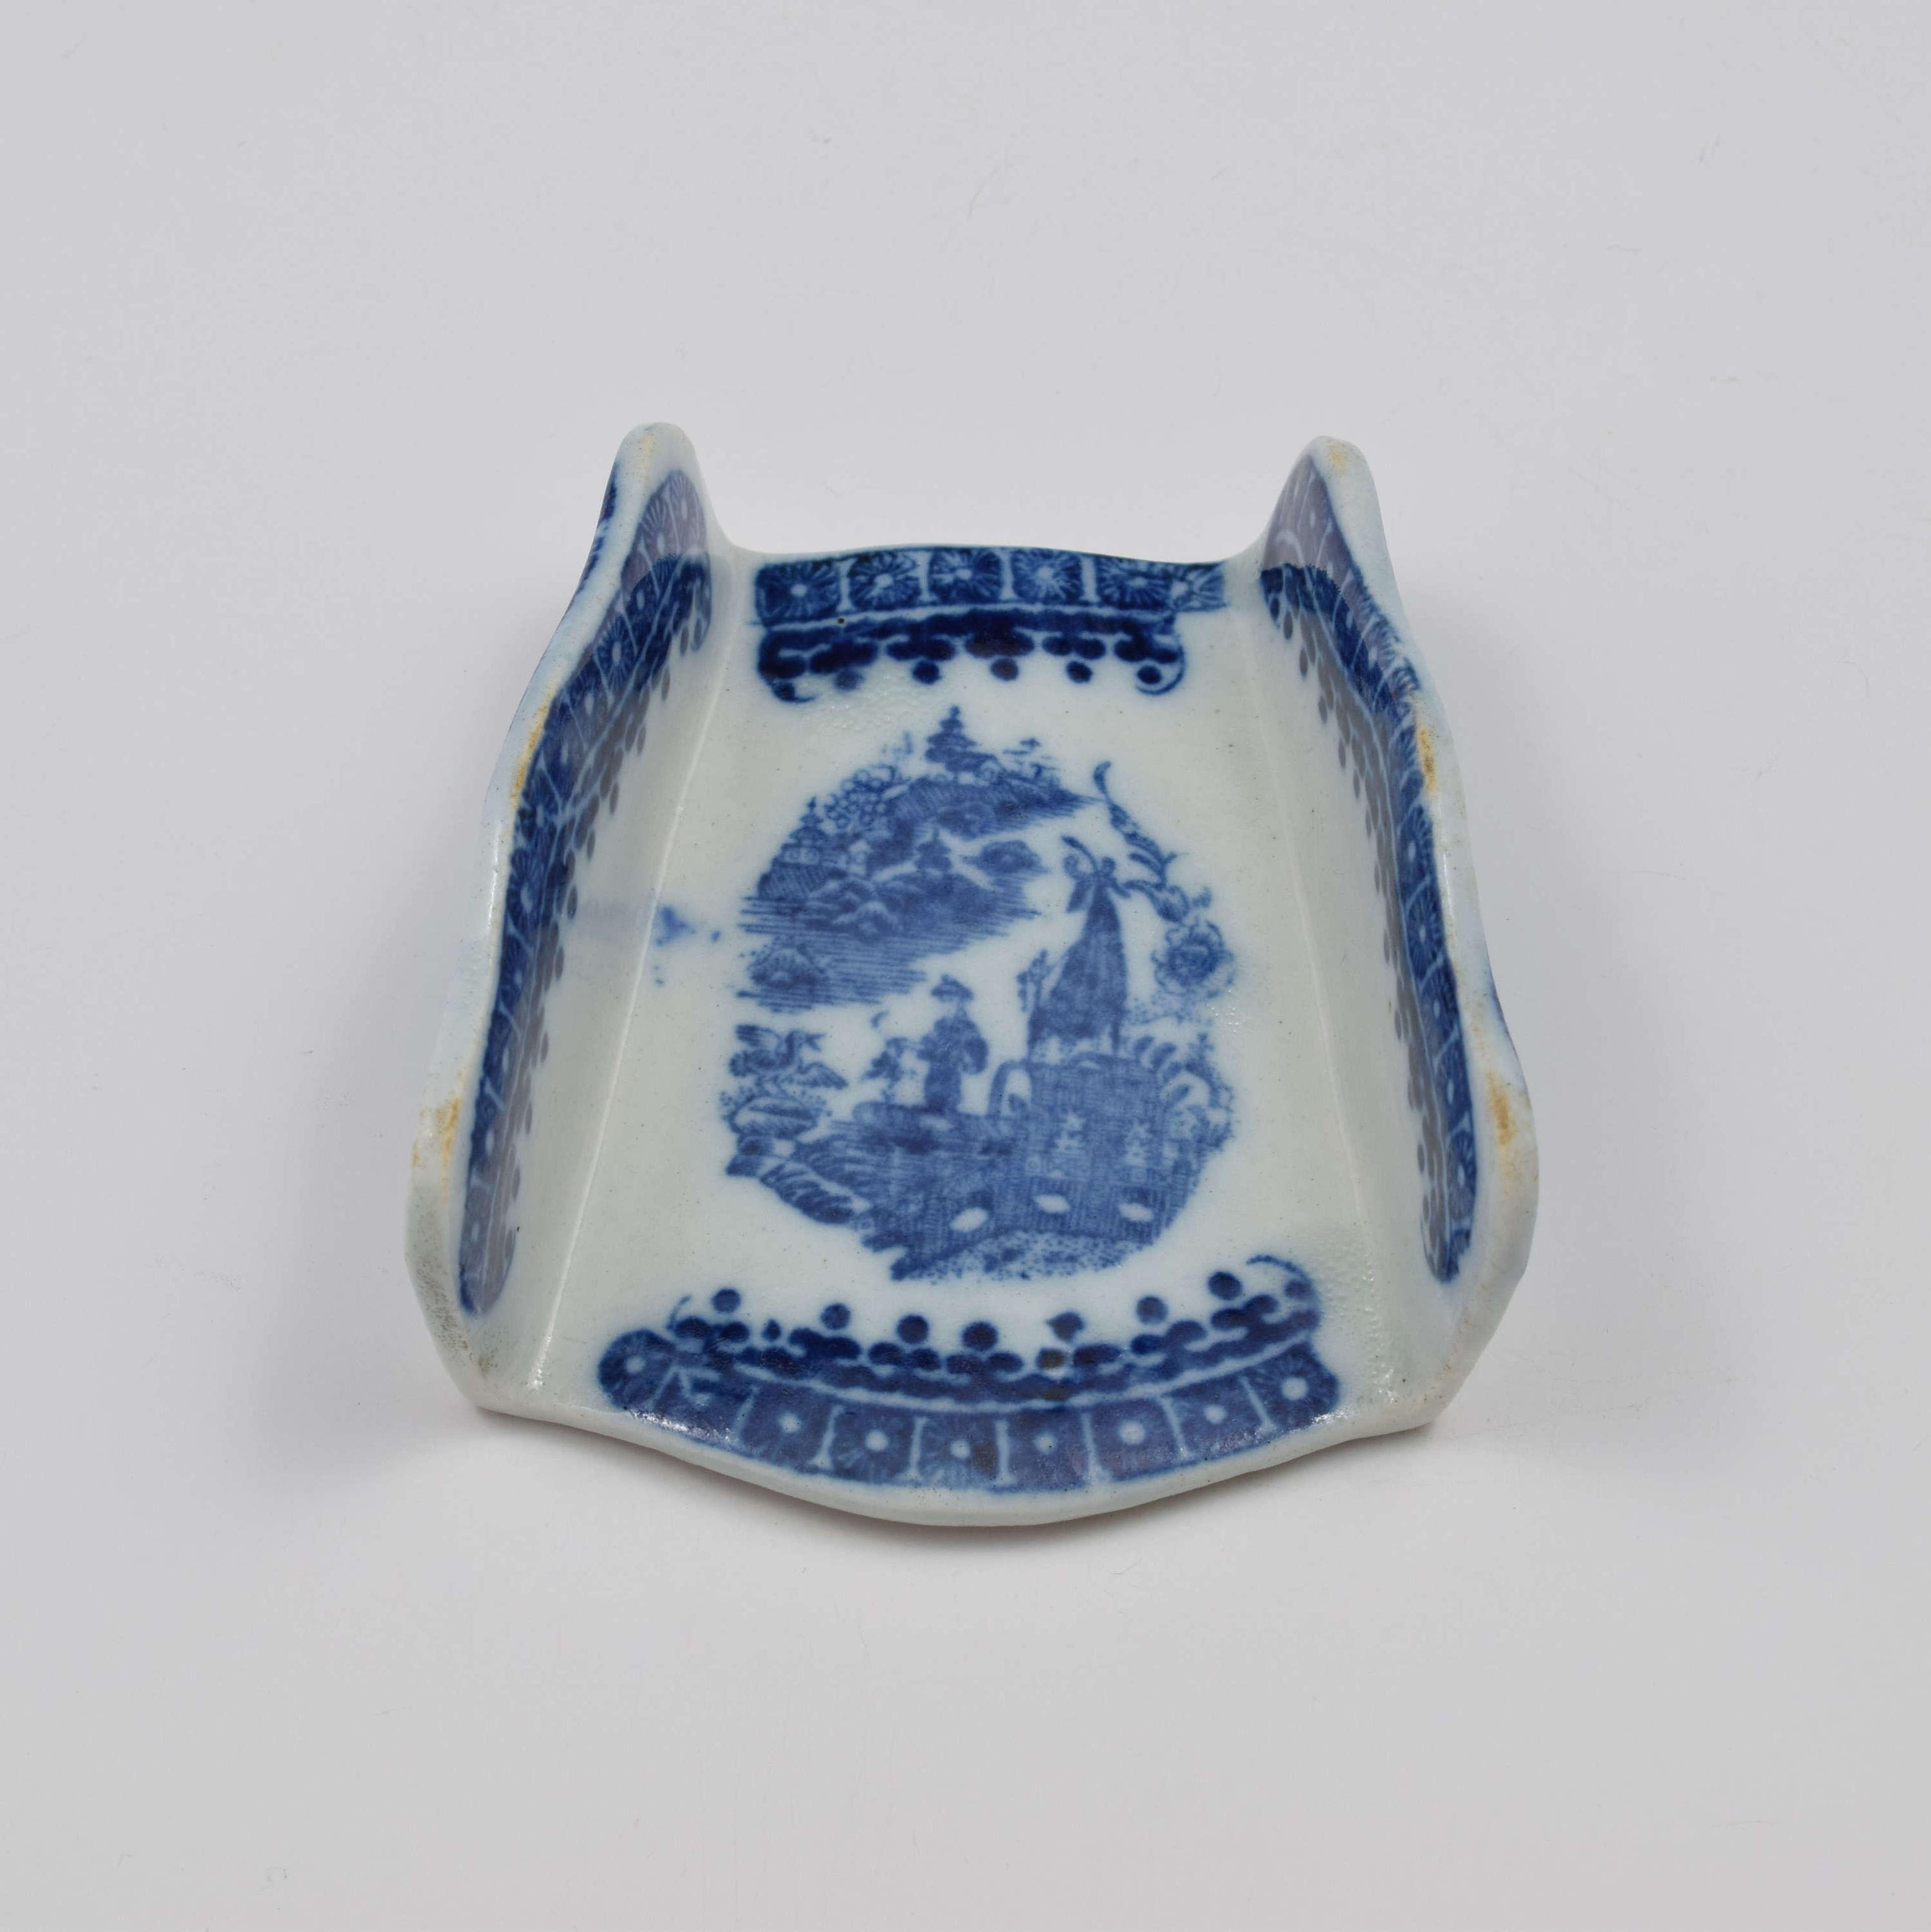 Caughley Porcelain Fisherman Asparagus Server c.1785